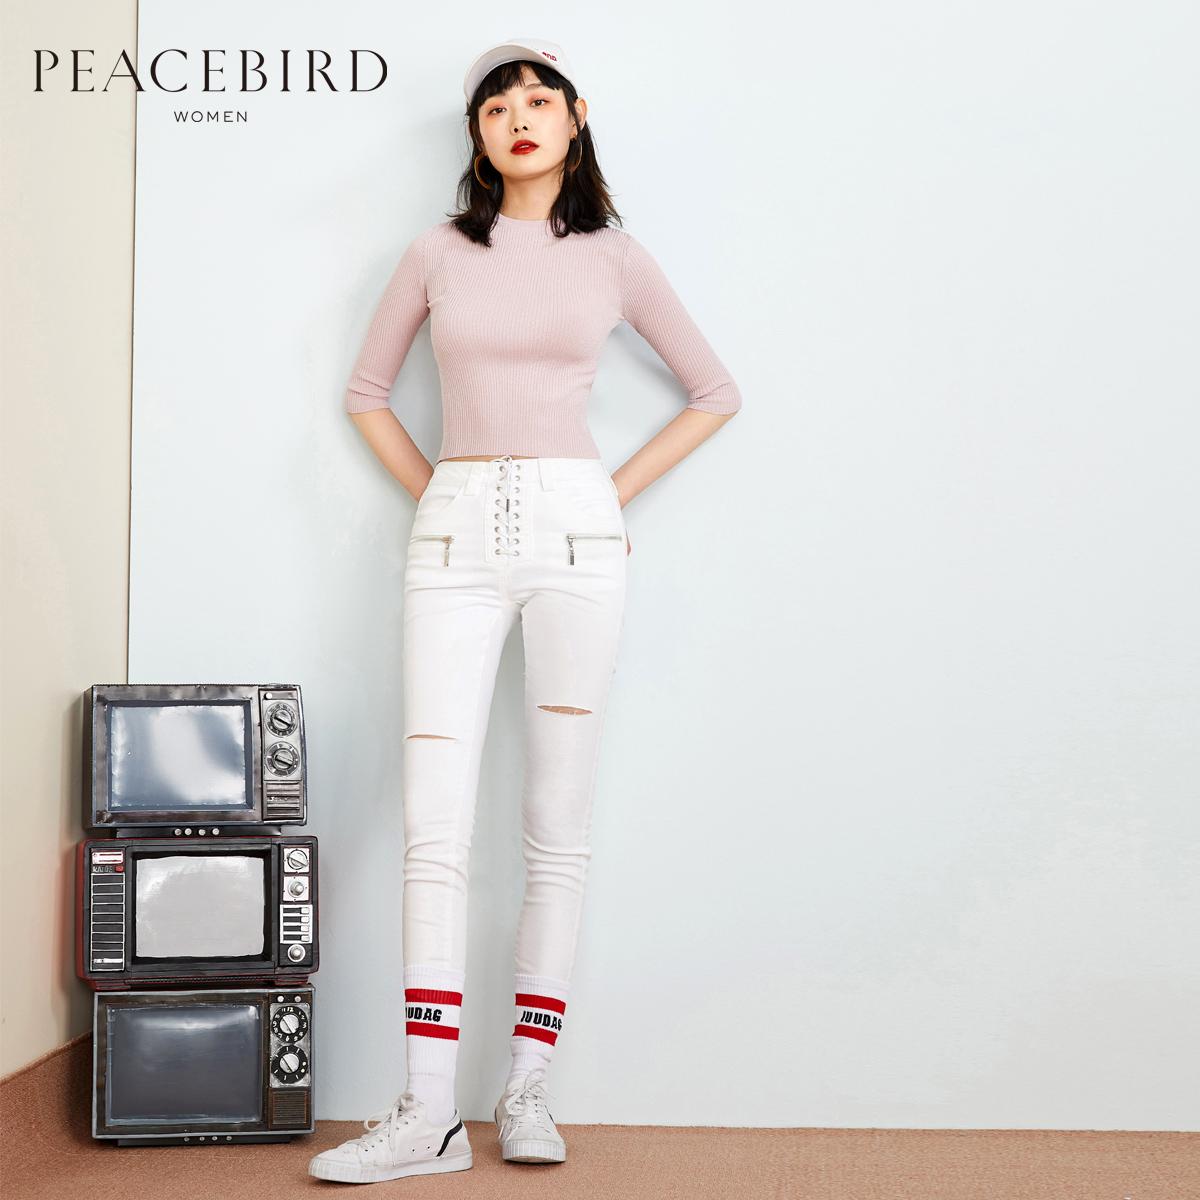 a784b455ea High waist jeans female spring new Korean version of the white elastic feet pants  slim hole pencil pants Pacific bird female